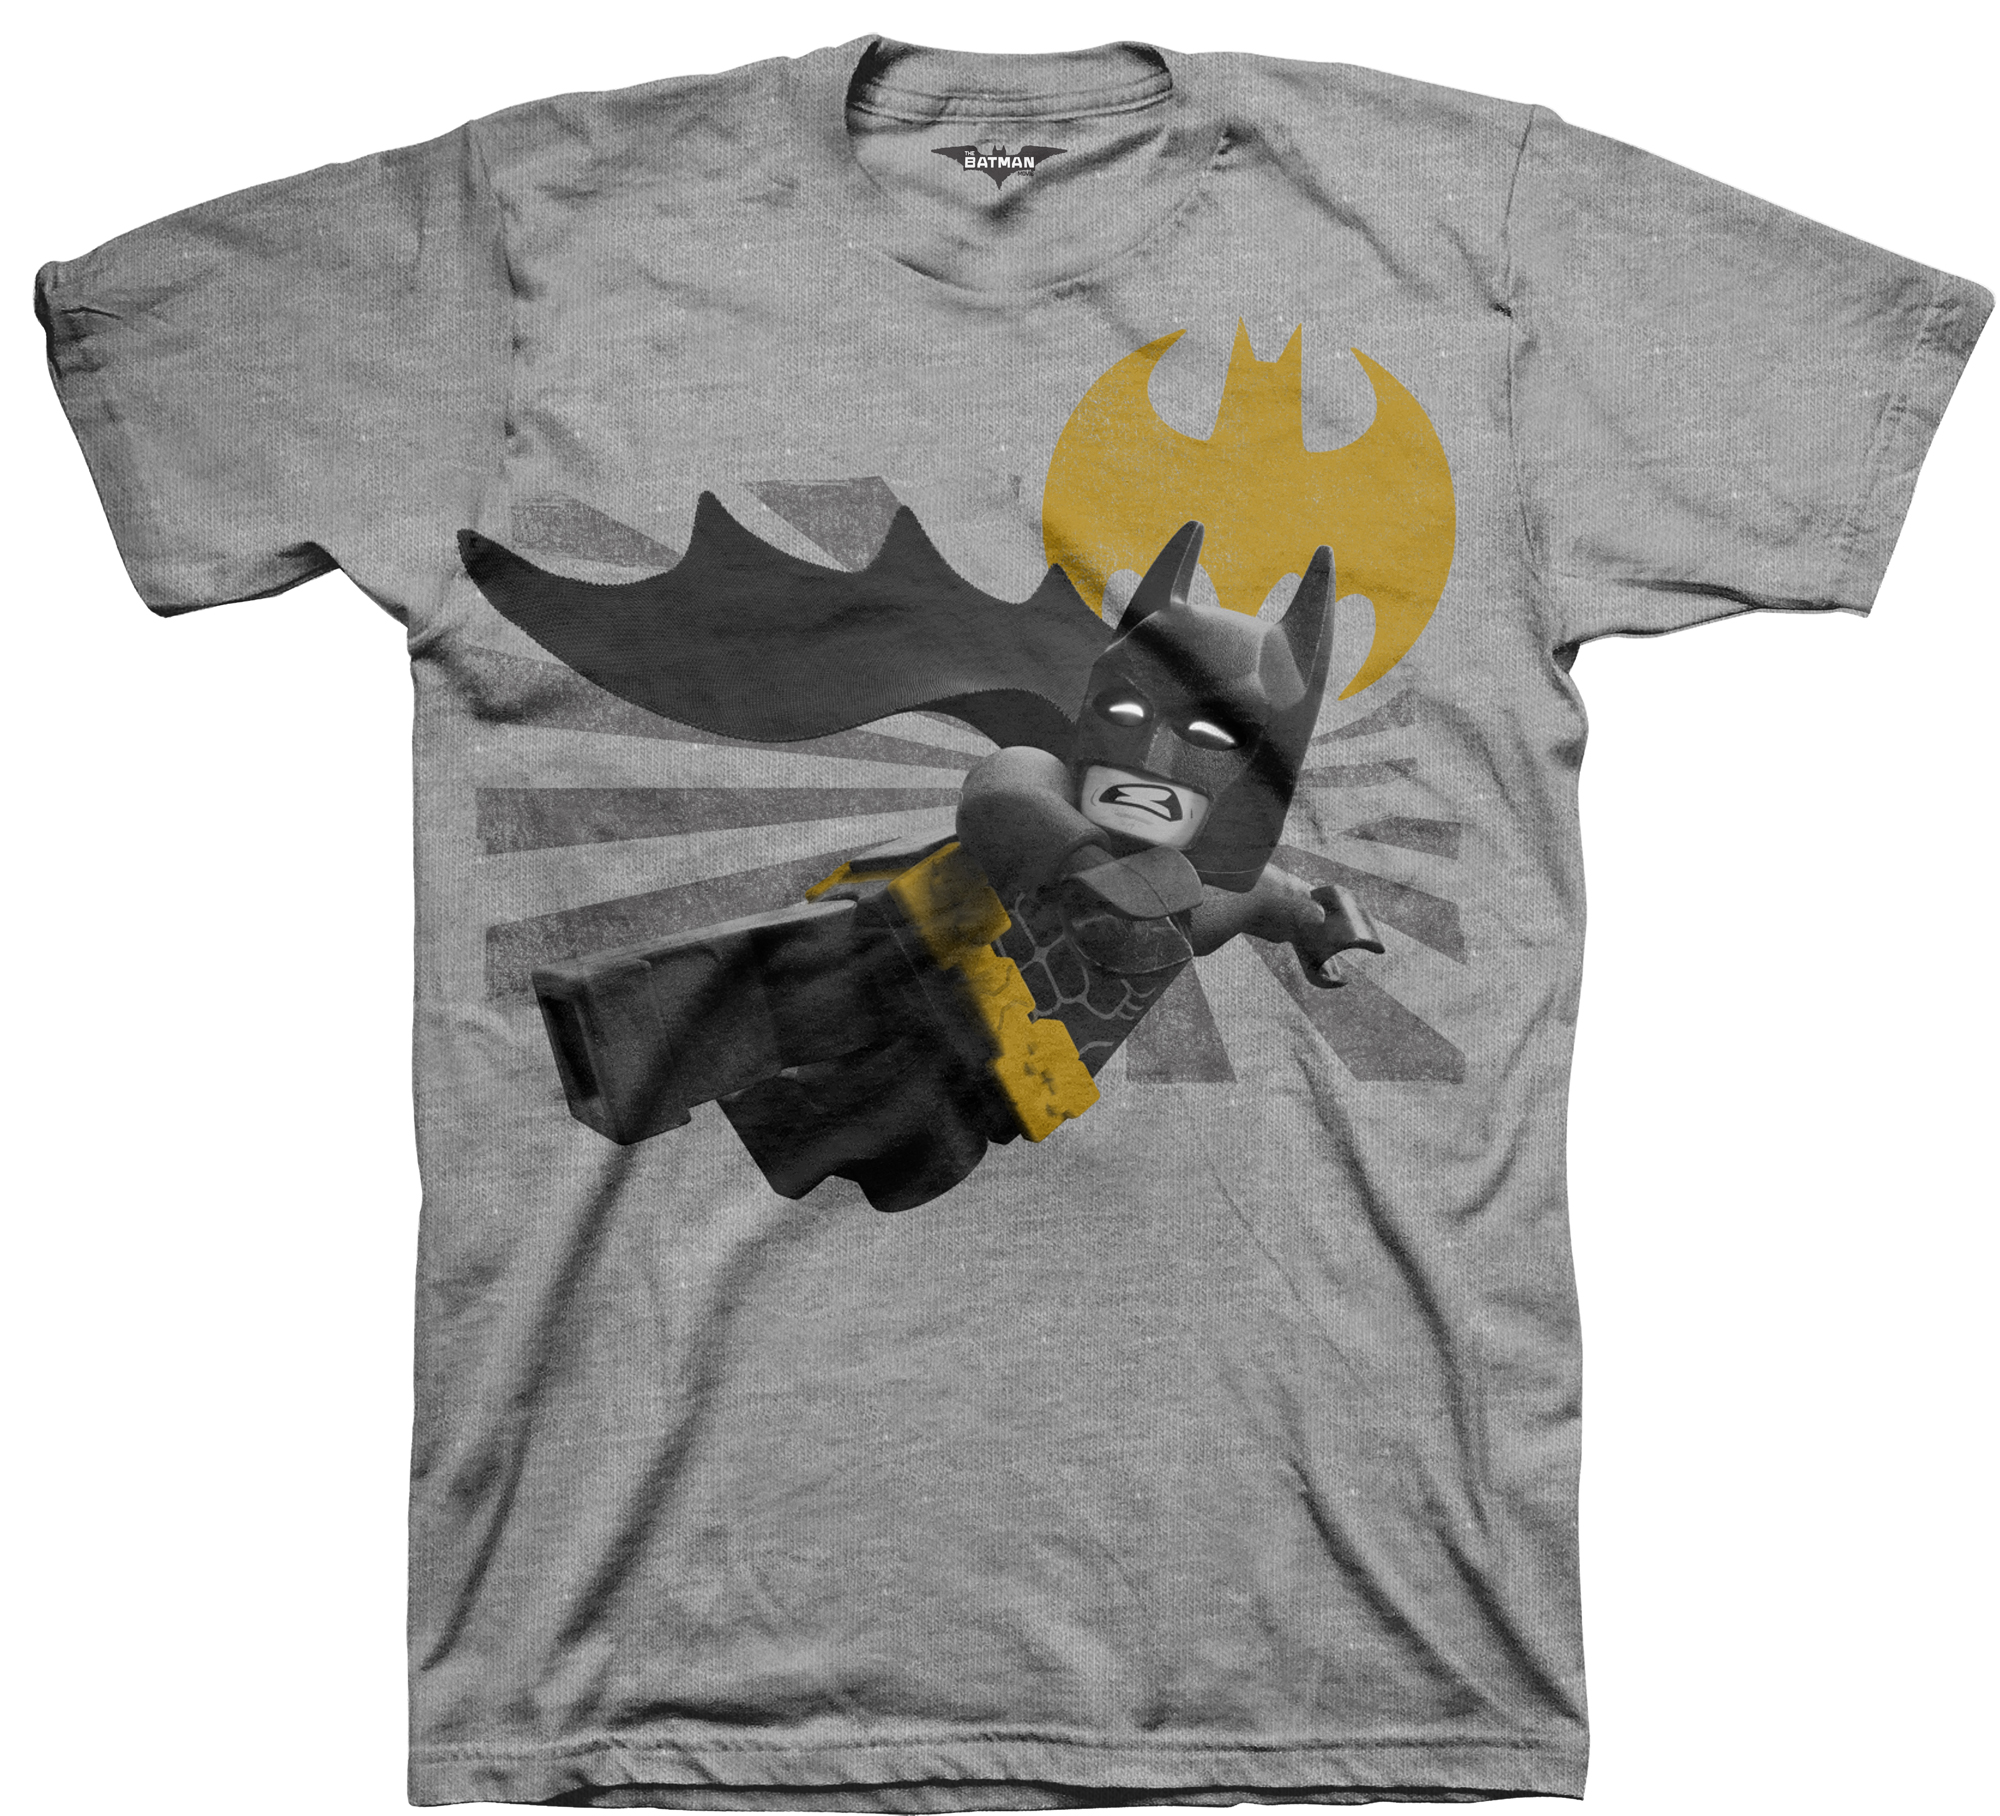 5f3b89295 Batman Shirts Walmart – Jerusalem House